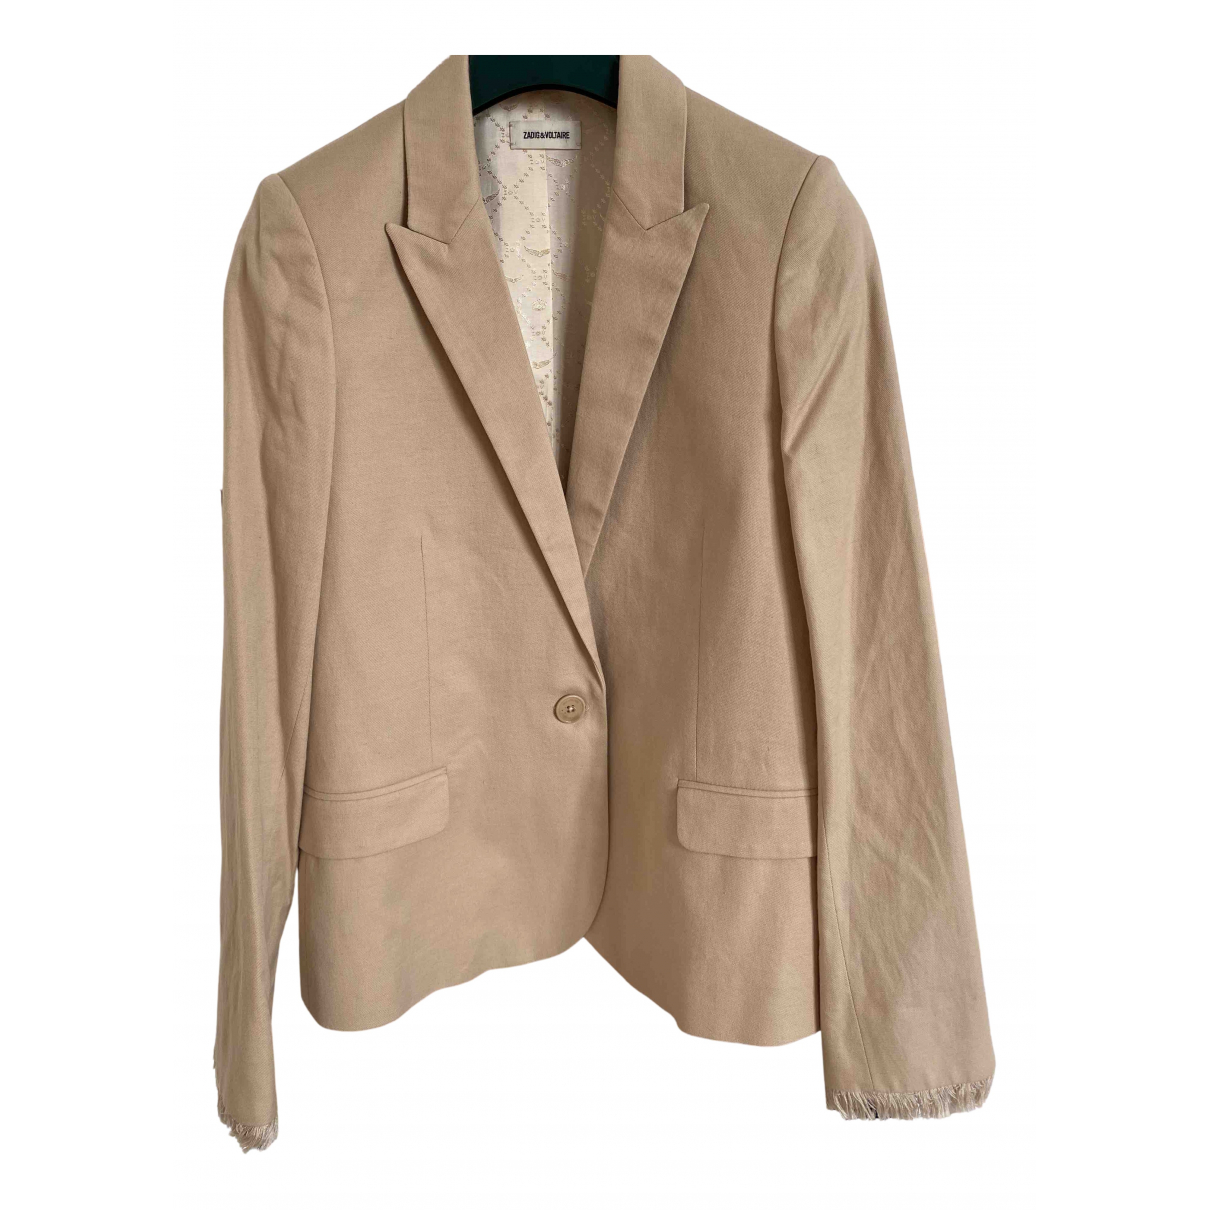 Zadig & Voltaire Spring Summer 2020 Beige Cotton jacket for Women 34 FR